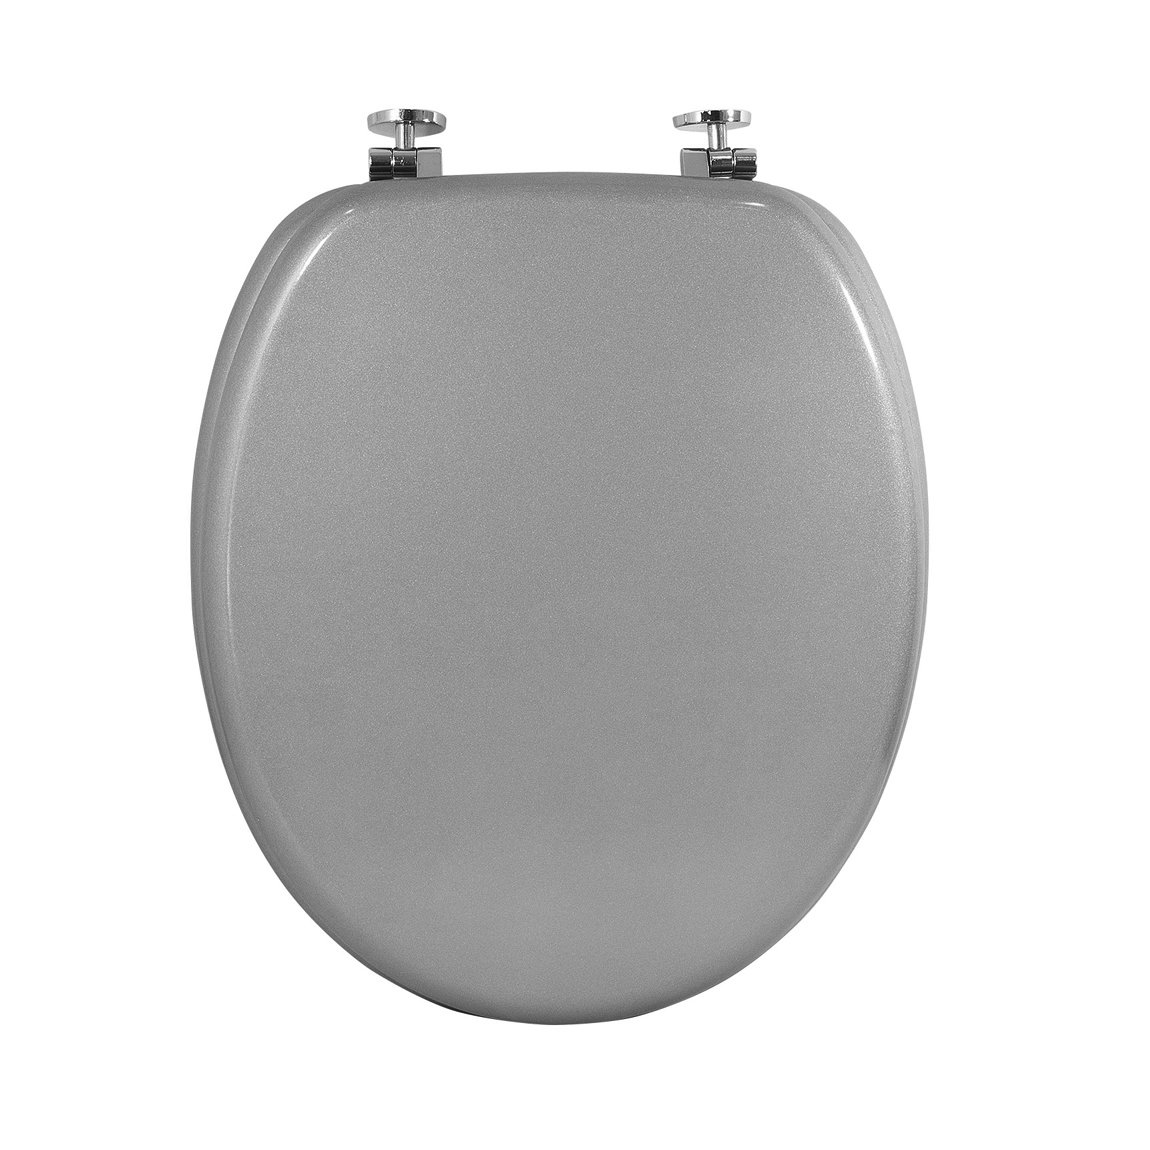 carpemodo wc sitz toilettendeckel holz deckel grau ebay. Black Bedroom Furniture Sets. Home Design Ideas